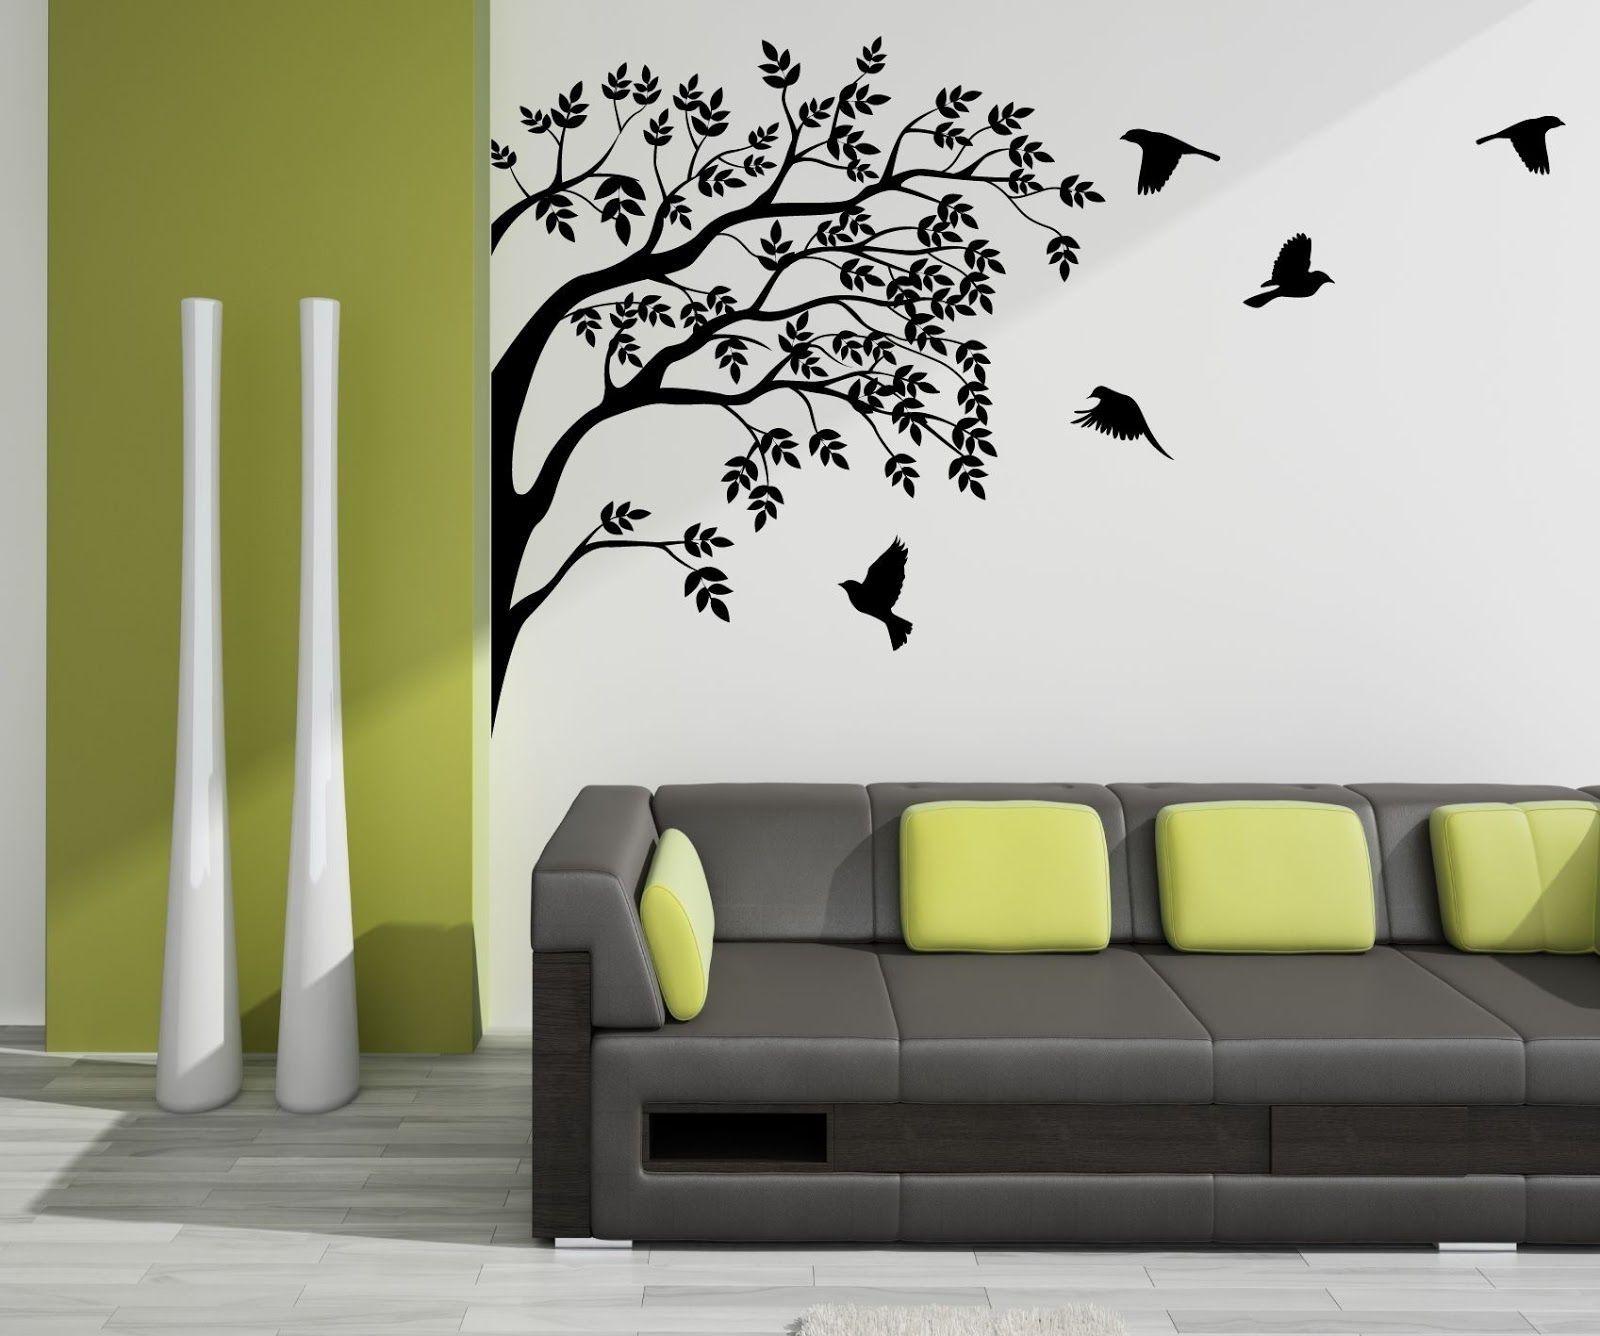 Creative Photo Of Creative Wall Painting Ideas Dekorasi Dinding